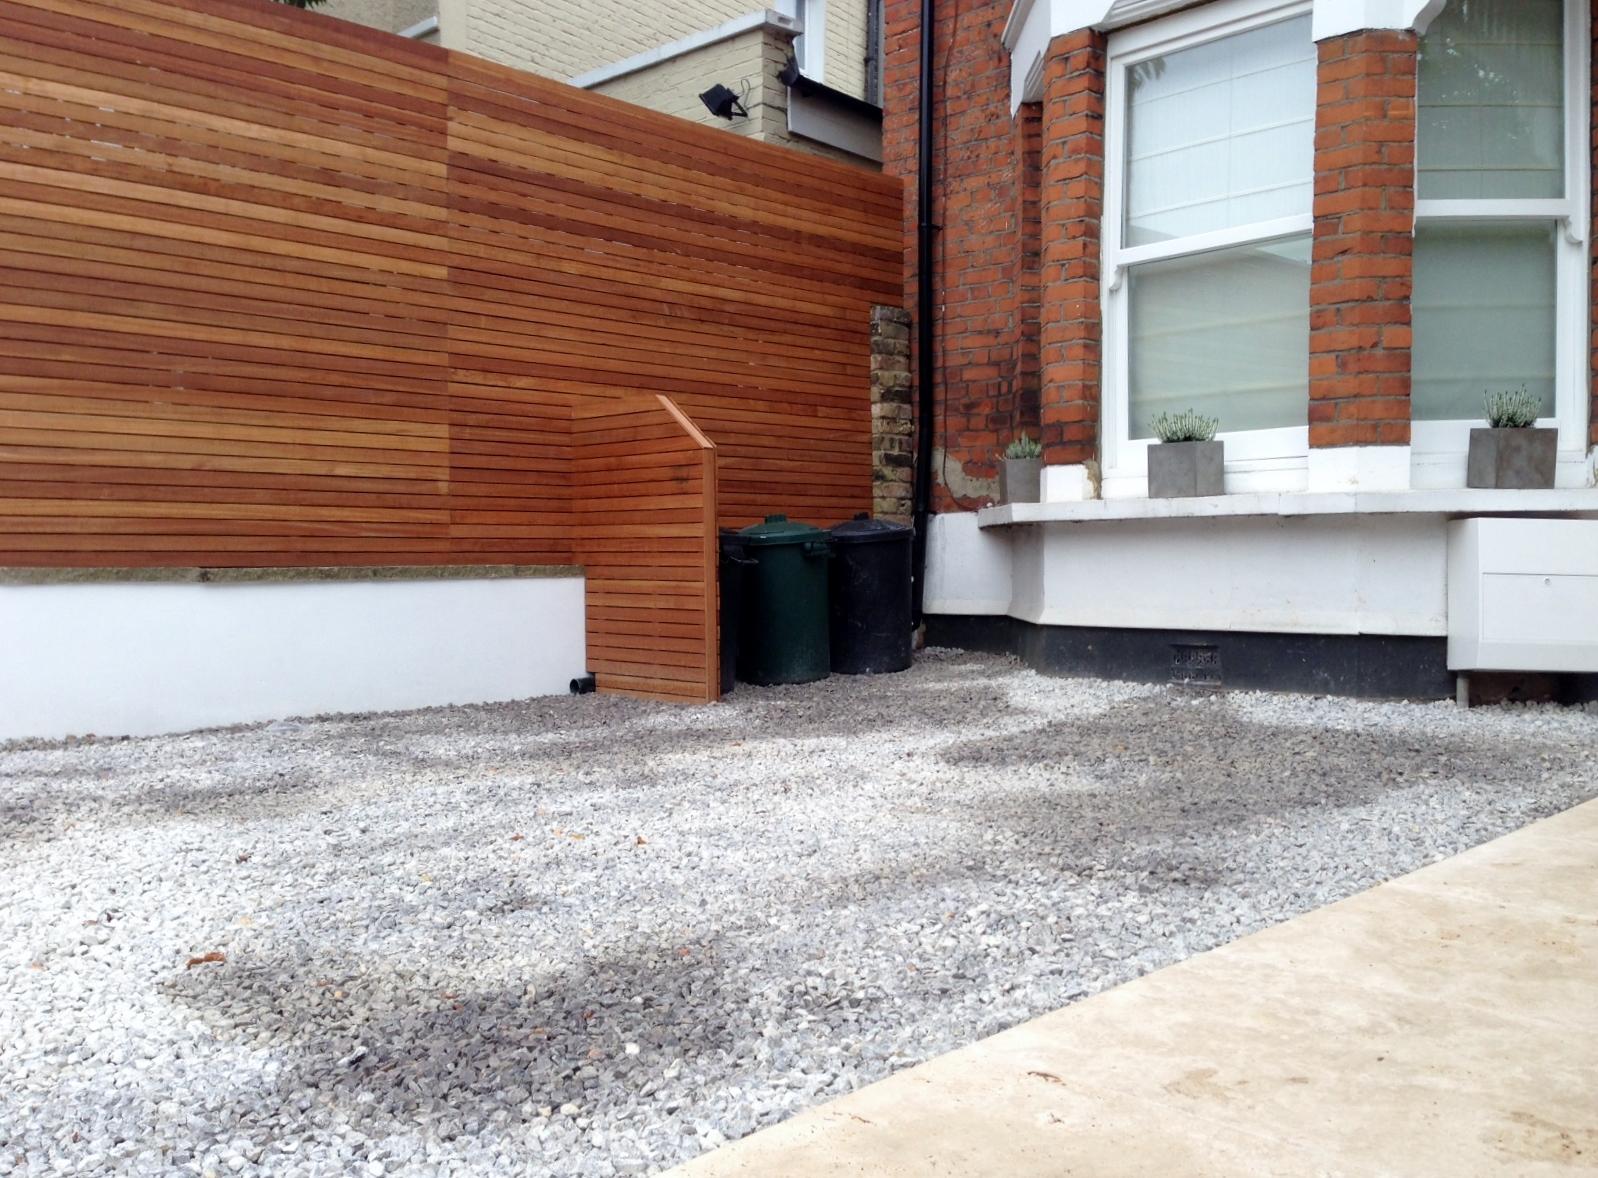 front garden drivewat gravel travertine paving path hardwood privacy screen trellis tooting london (6)